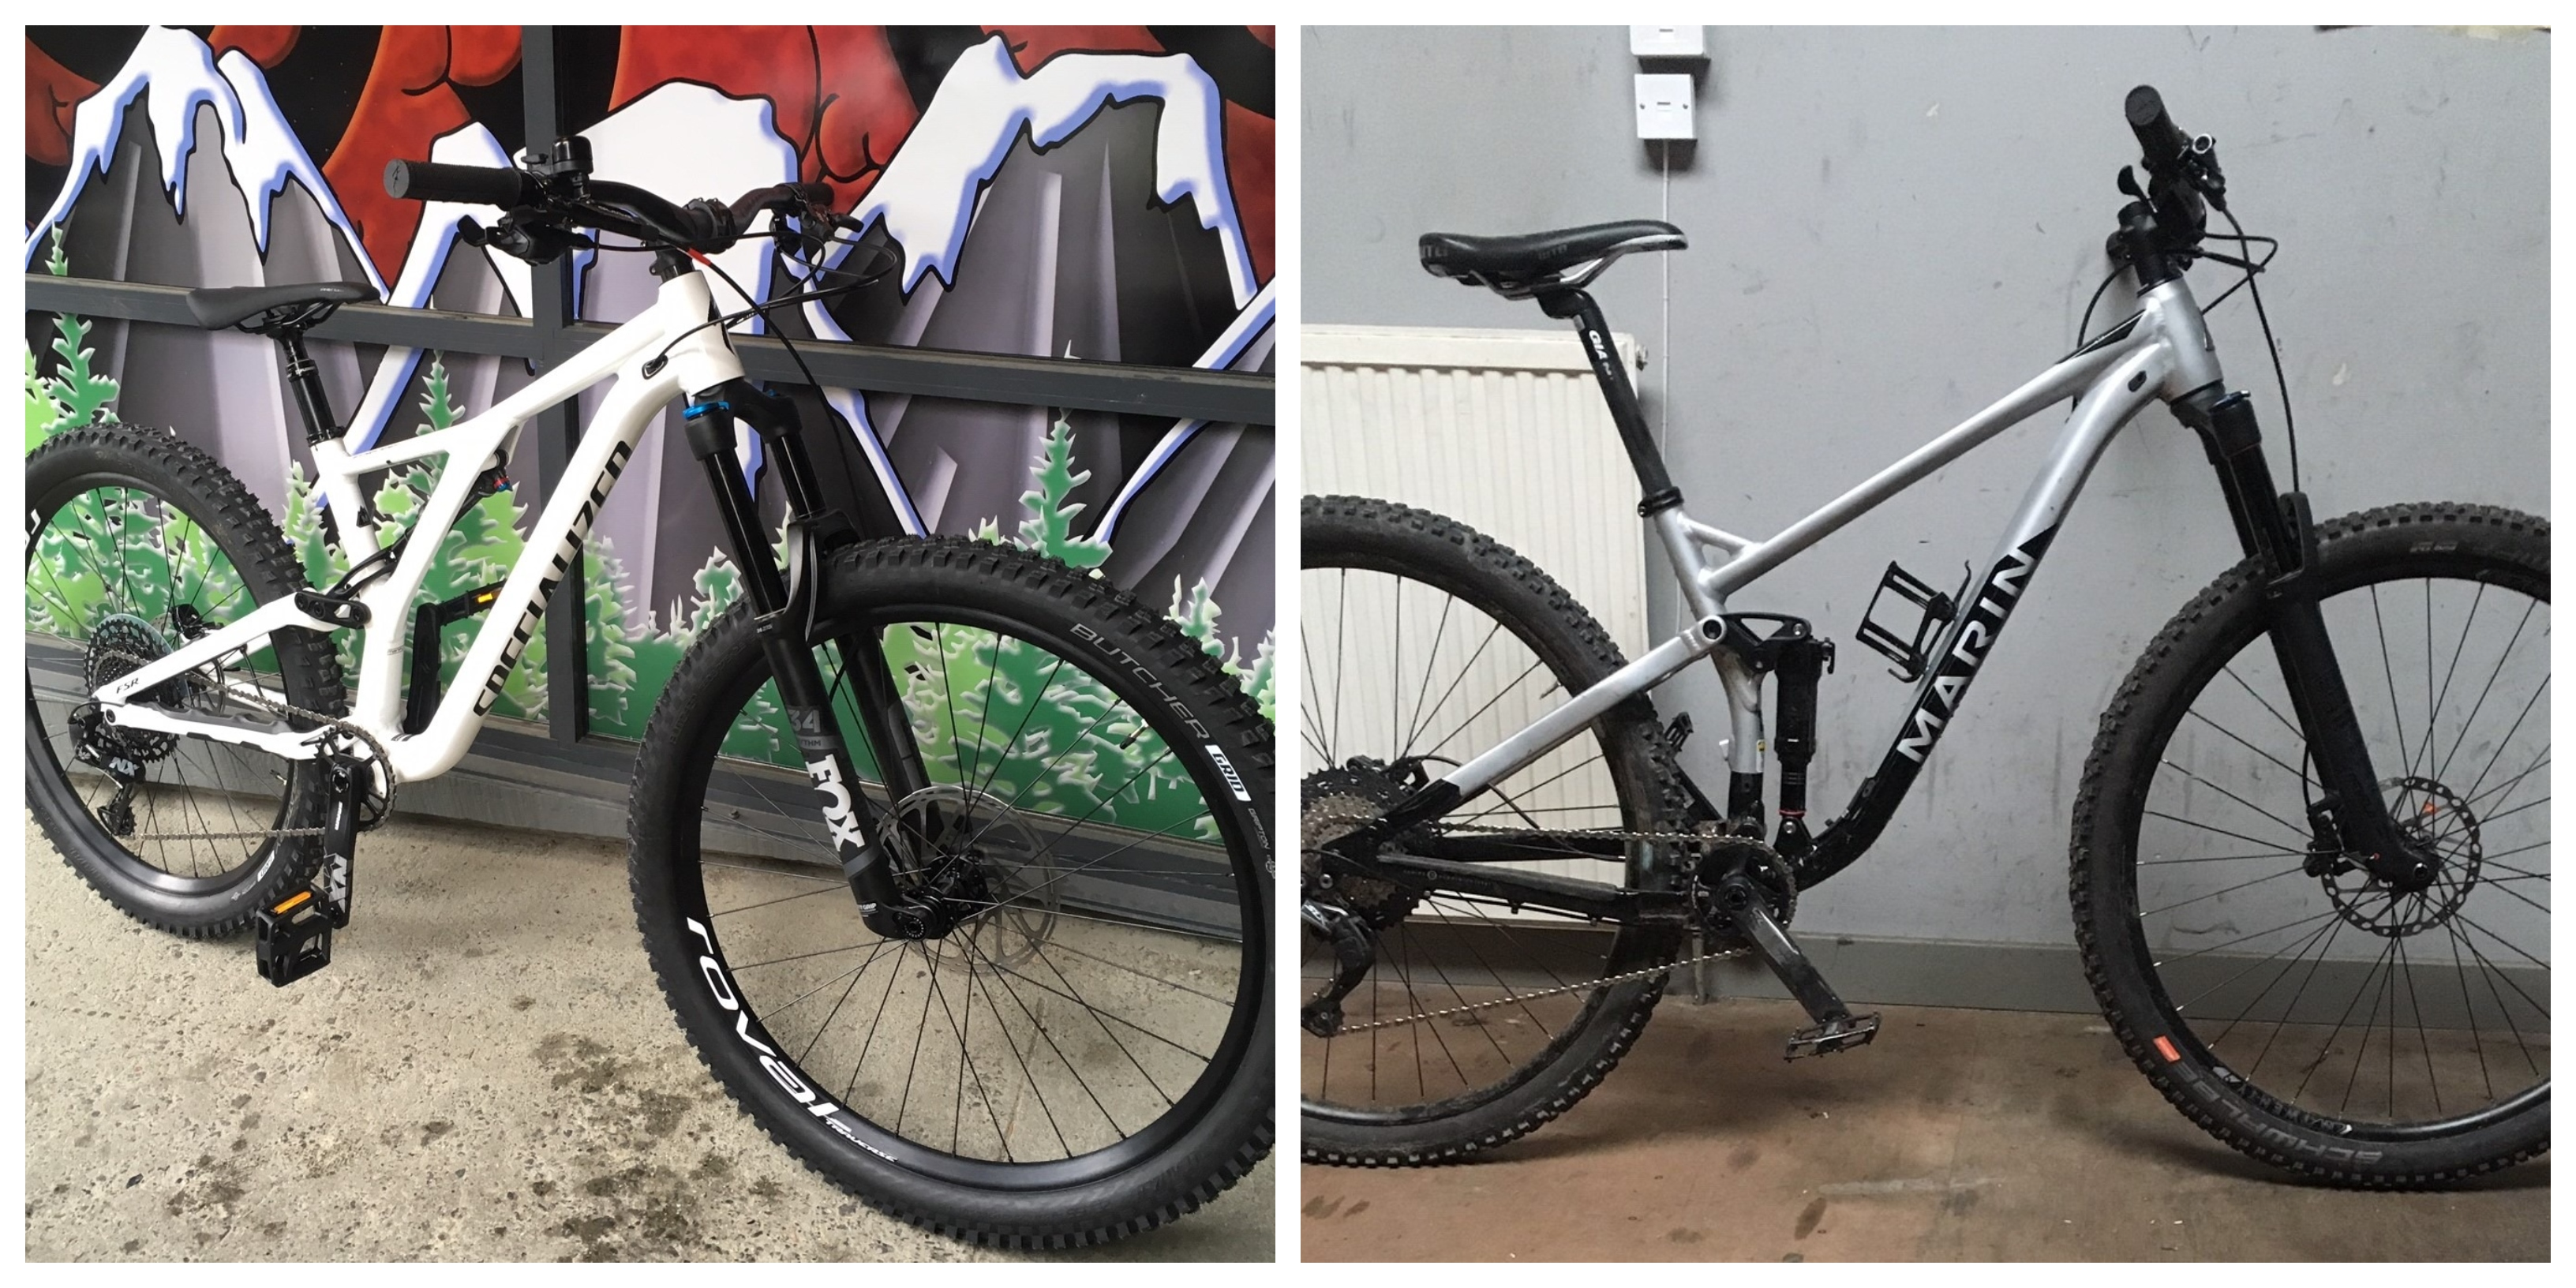 The stolen bikes from Forbesfield Road in Aberdeen.